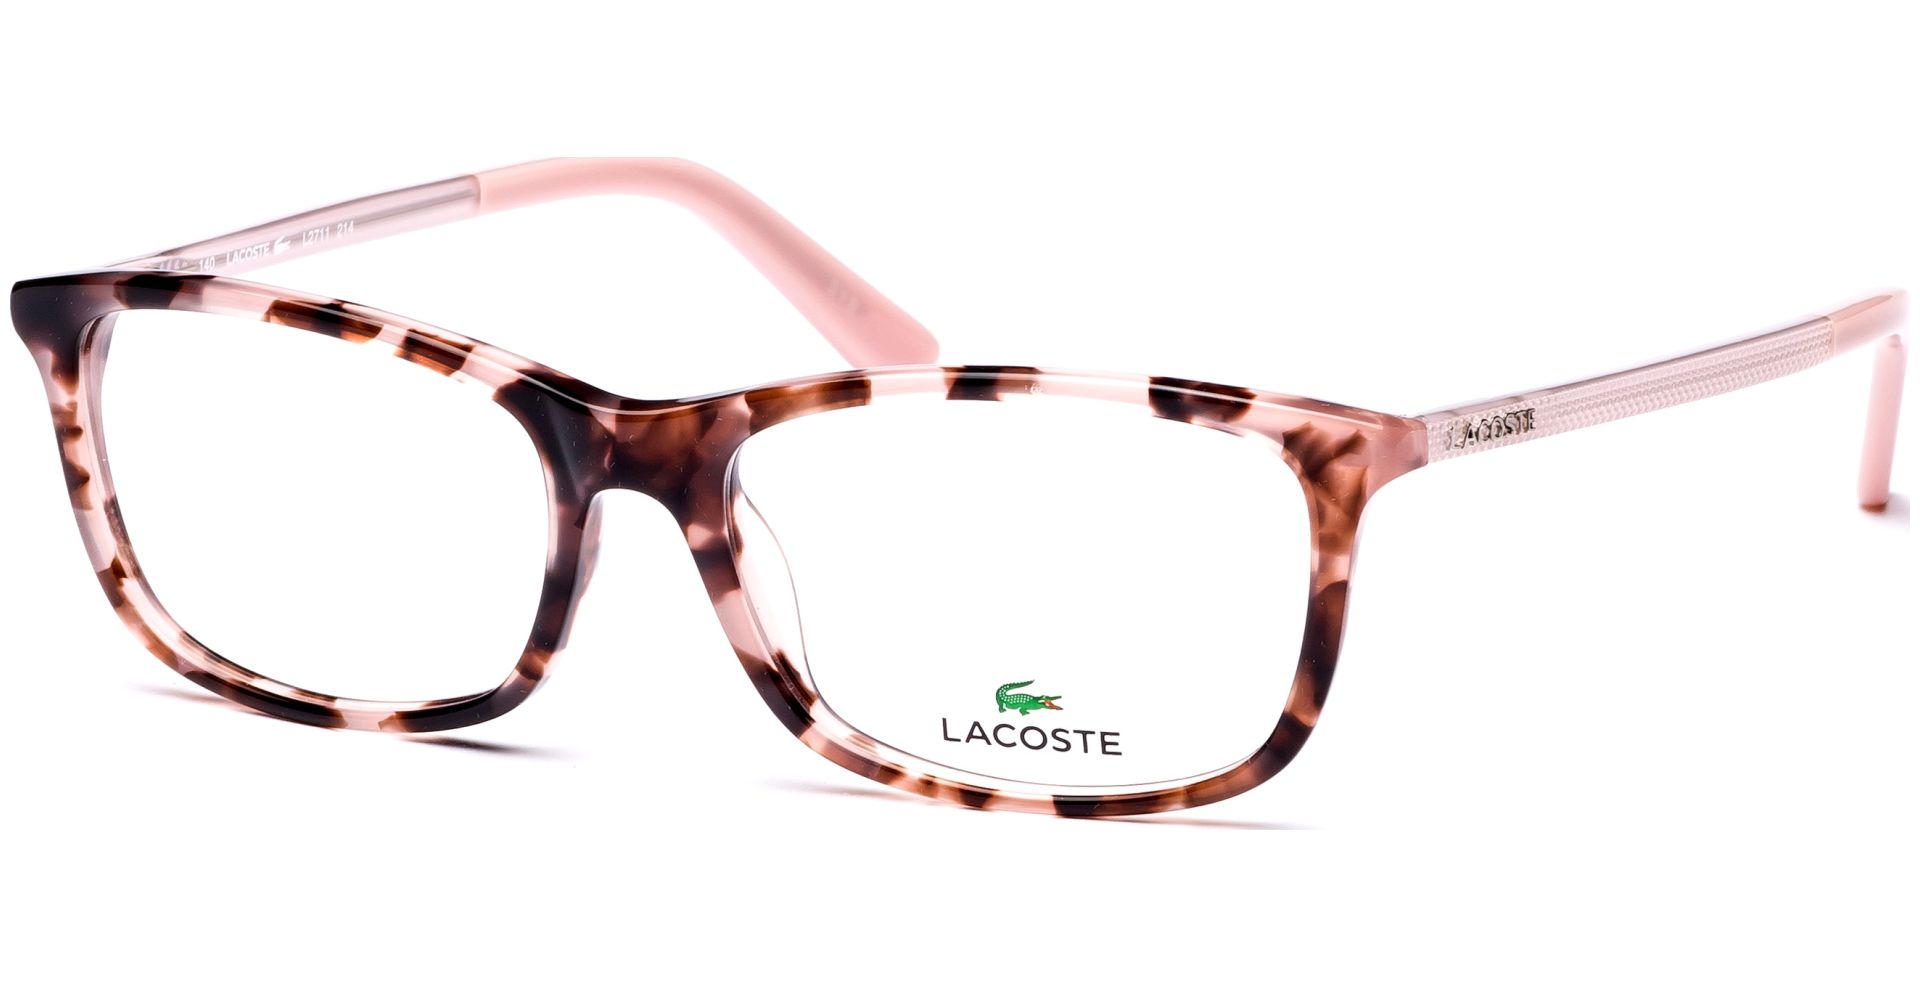 Lacoste - L2711 214 5316 Rose Havana - von Lensbest